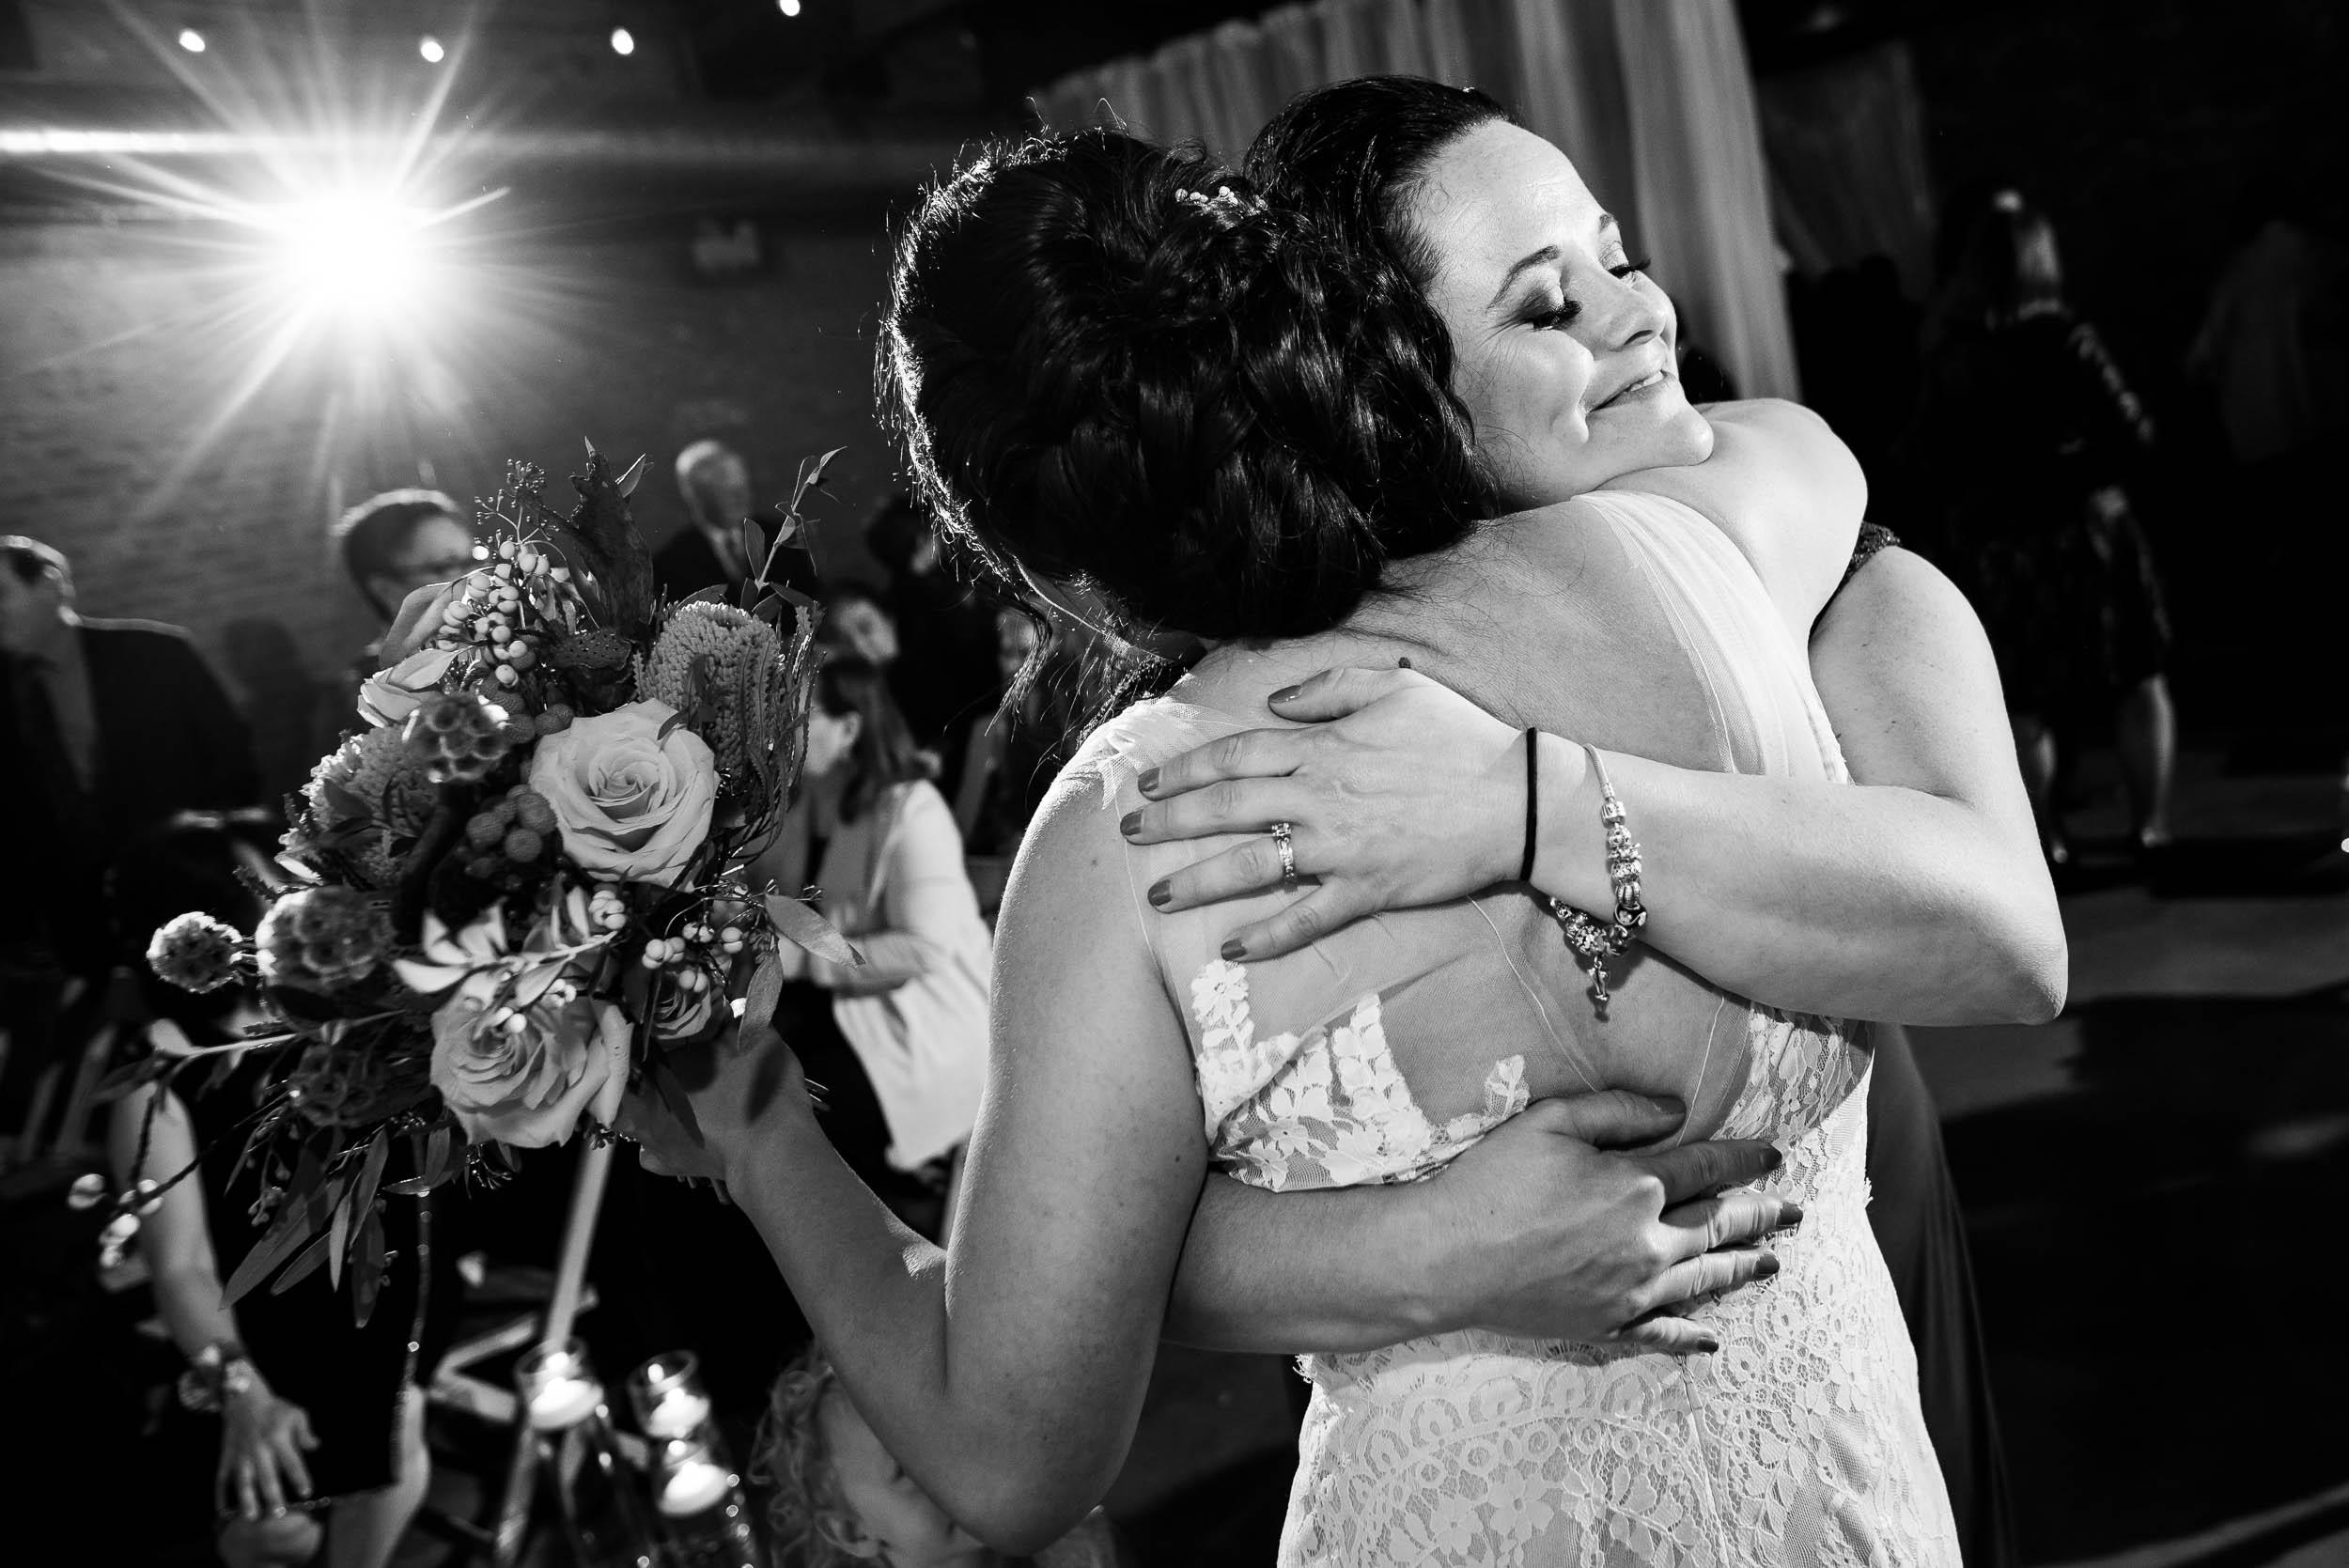 Sisters hug during a Loft on Lake Chicago wedding.